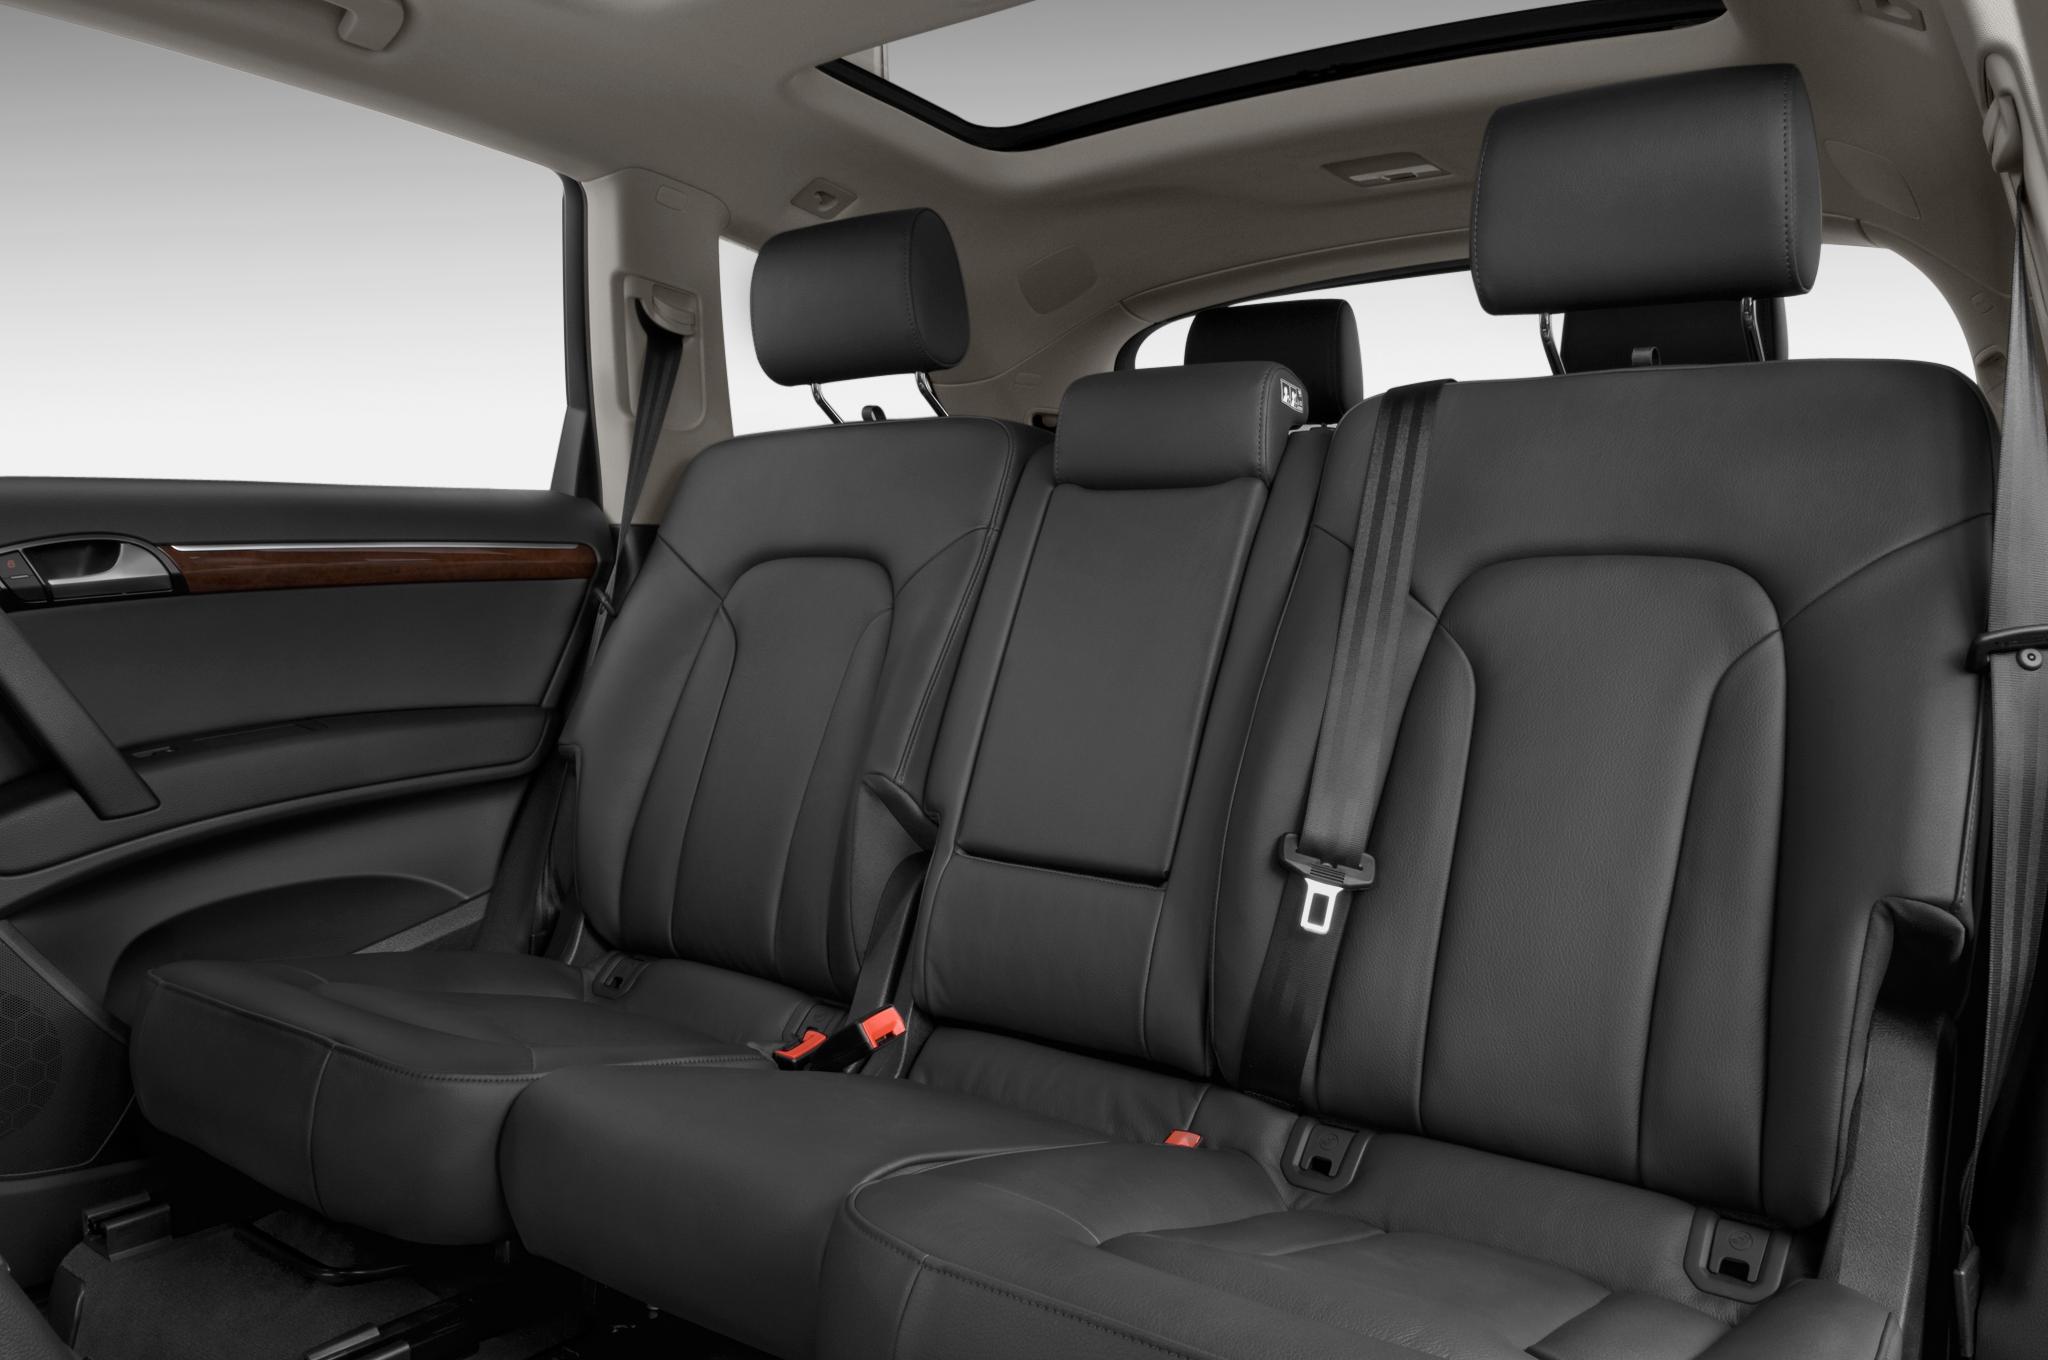 2010 Audi Q7 - First Look: Audi Luxury Crossover SUV Review ... Audi Suv Interior on 2015 infinity interior, 2015 dodge power wagon interior, 2015 audi tt roadster interior, 2015 audi q7 interior, 2015 audi a8l interior, 2015 audi s5 interior, 2015 audi coupe interior, 2015 audi s6 interior, 2015 audi tt rs interior, 2015 saturn vue interior, 2015 audi s7 interior, 2015 mazda rx7 interior, 2015 audi rs5 interior, 2015 audi a6 interior, 2015 porsche interior, 2015 audi truck interior, 2015 lamborghini interior, 2015 audi tts interior, 2015 buick century interior, 2015 audi allroad interior,